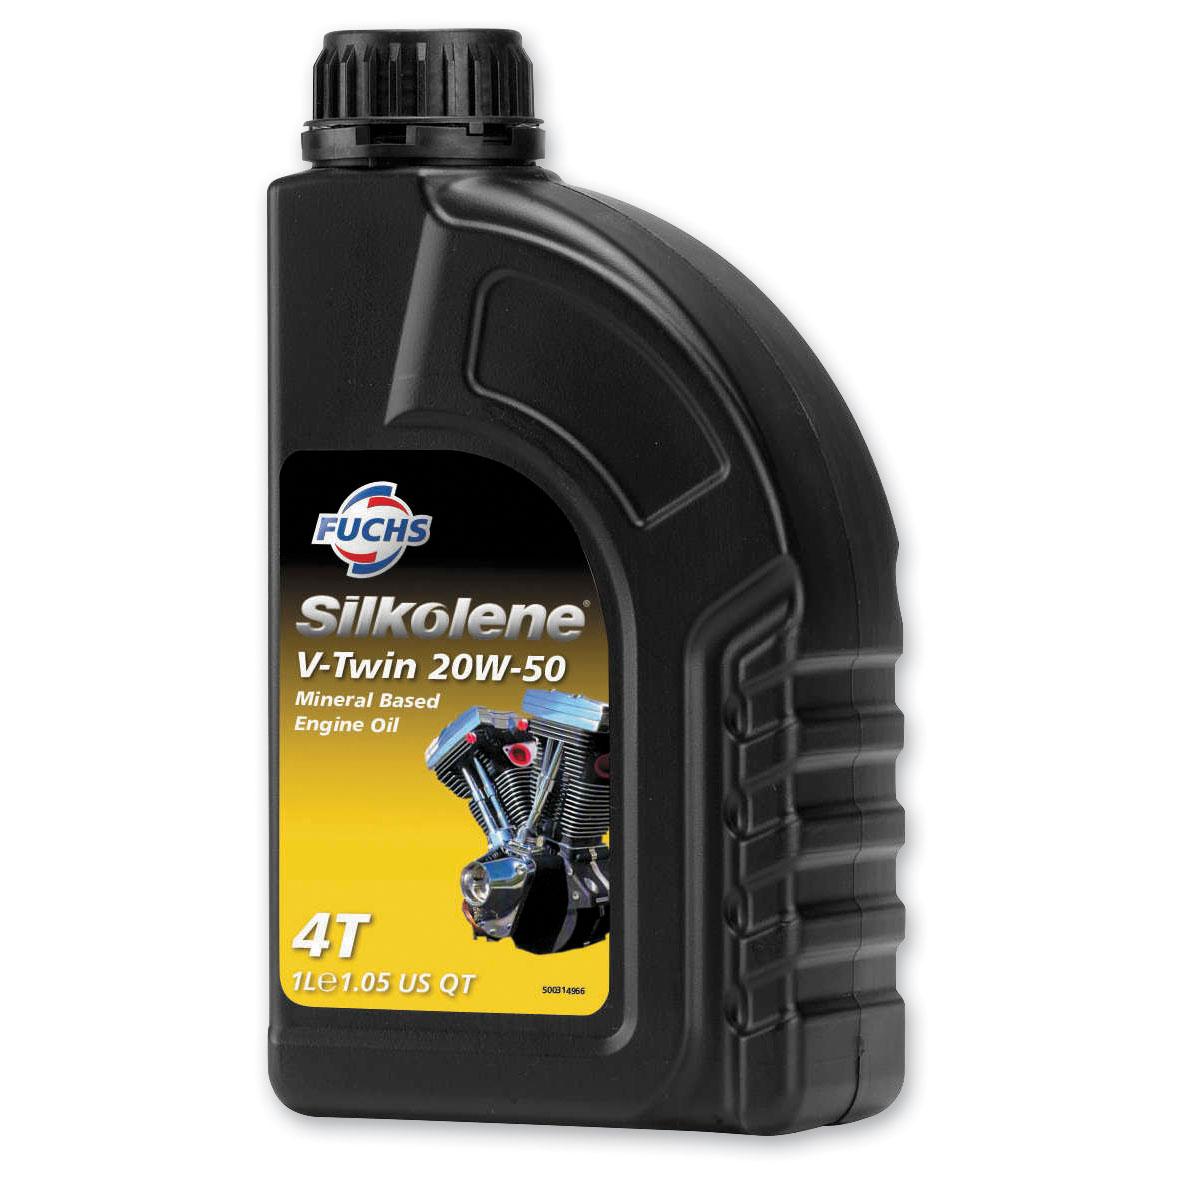 Silkolene V-Twin 20W50 Engine Oil